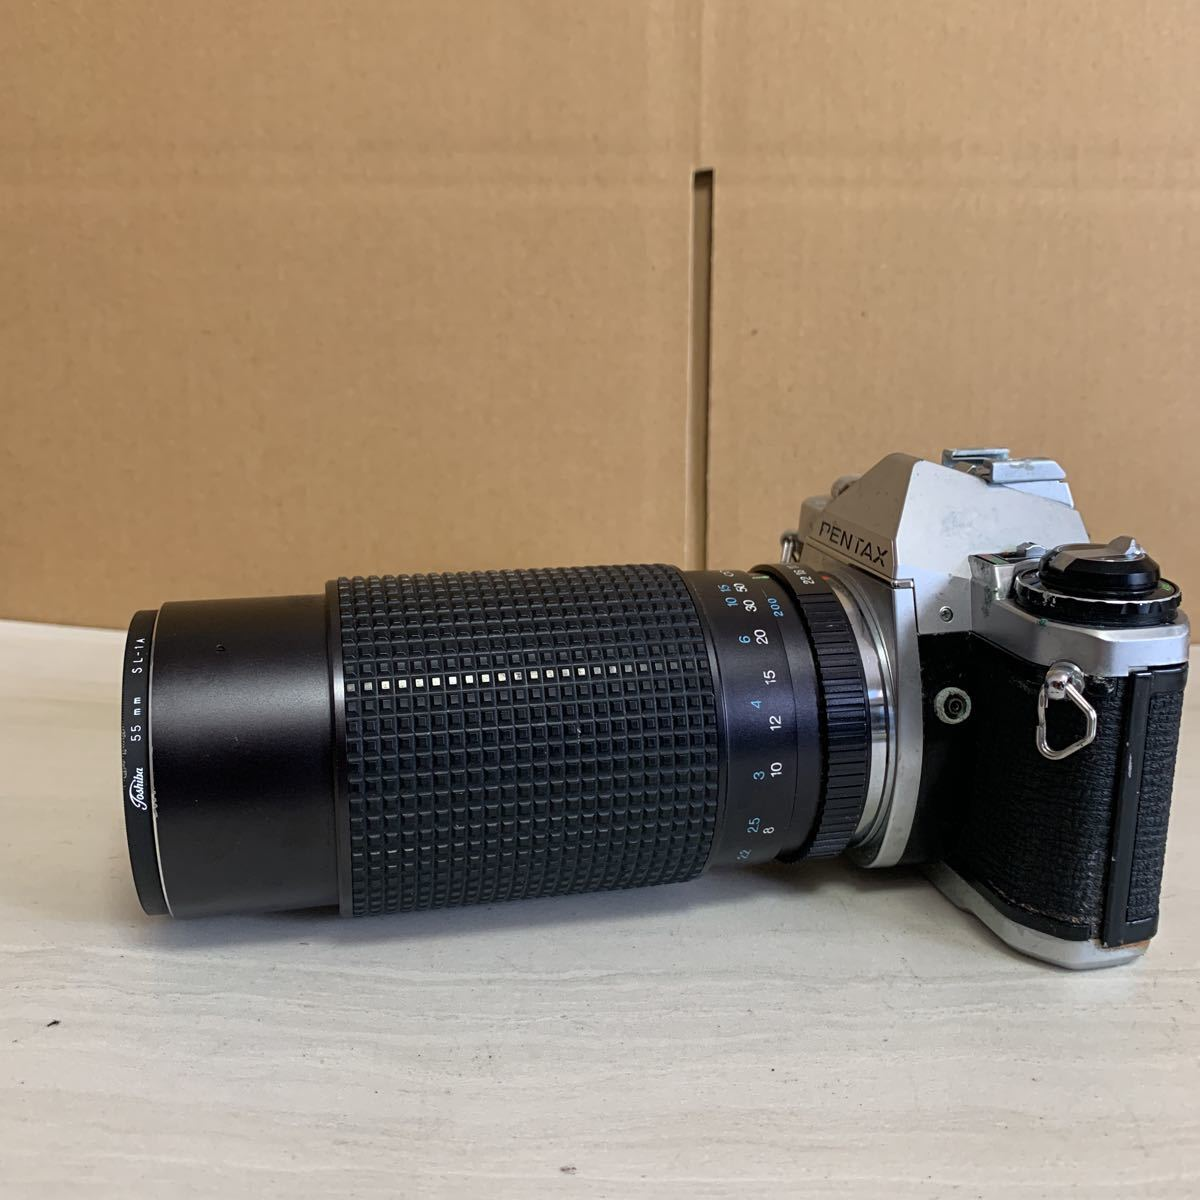 PENTAX ME F ペンタックス 一眼レフカメラ フィルムカメラ 未確認 2025_画像3